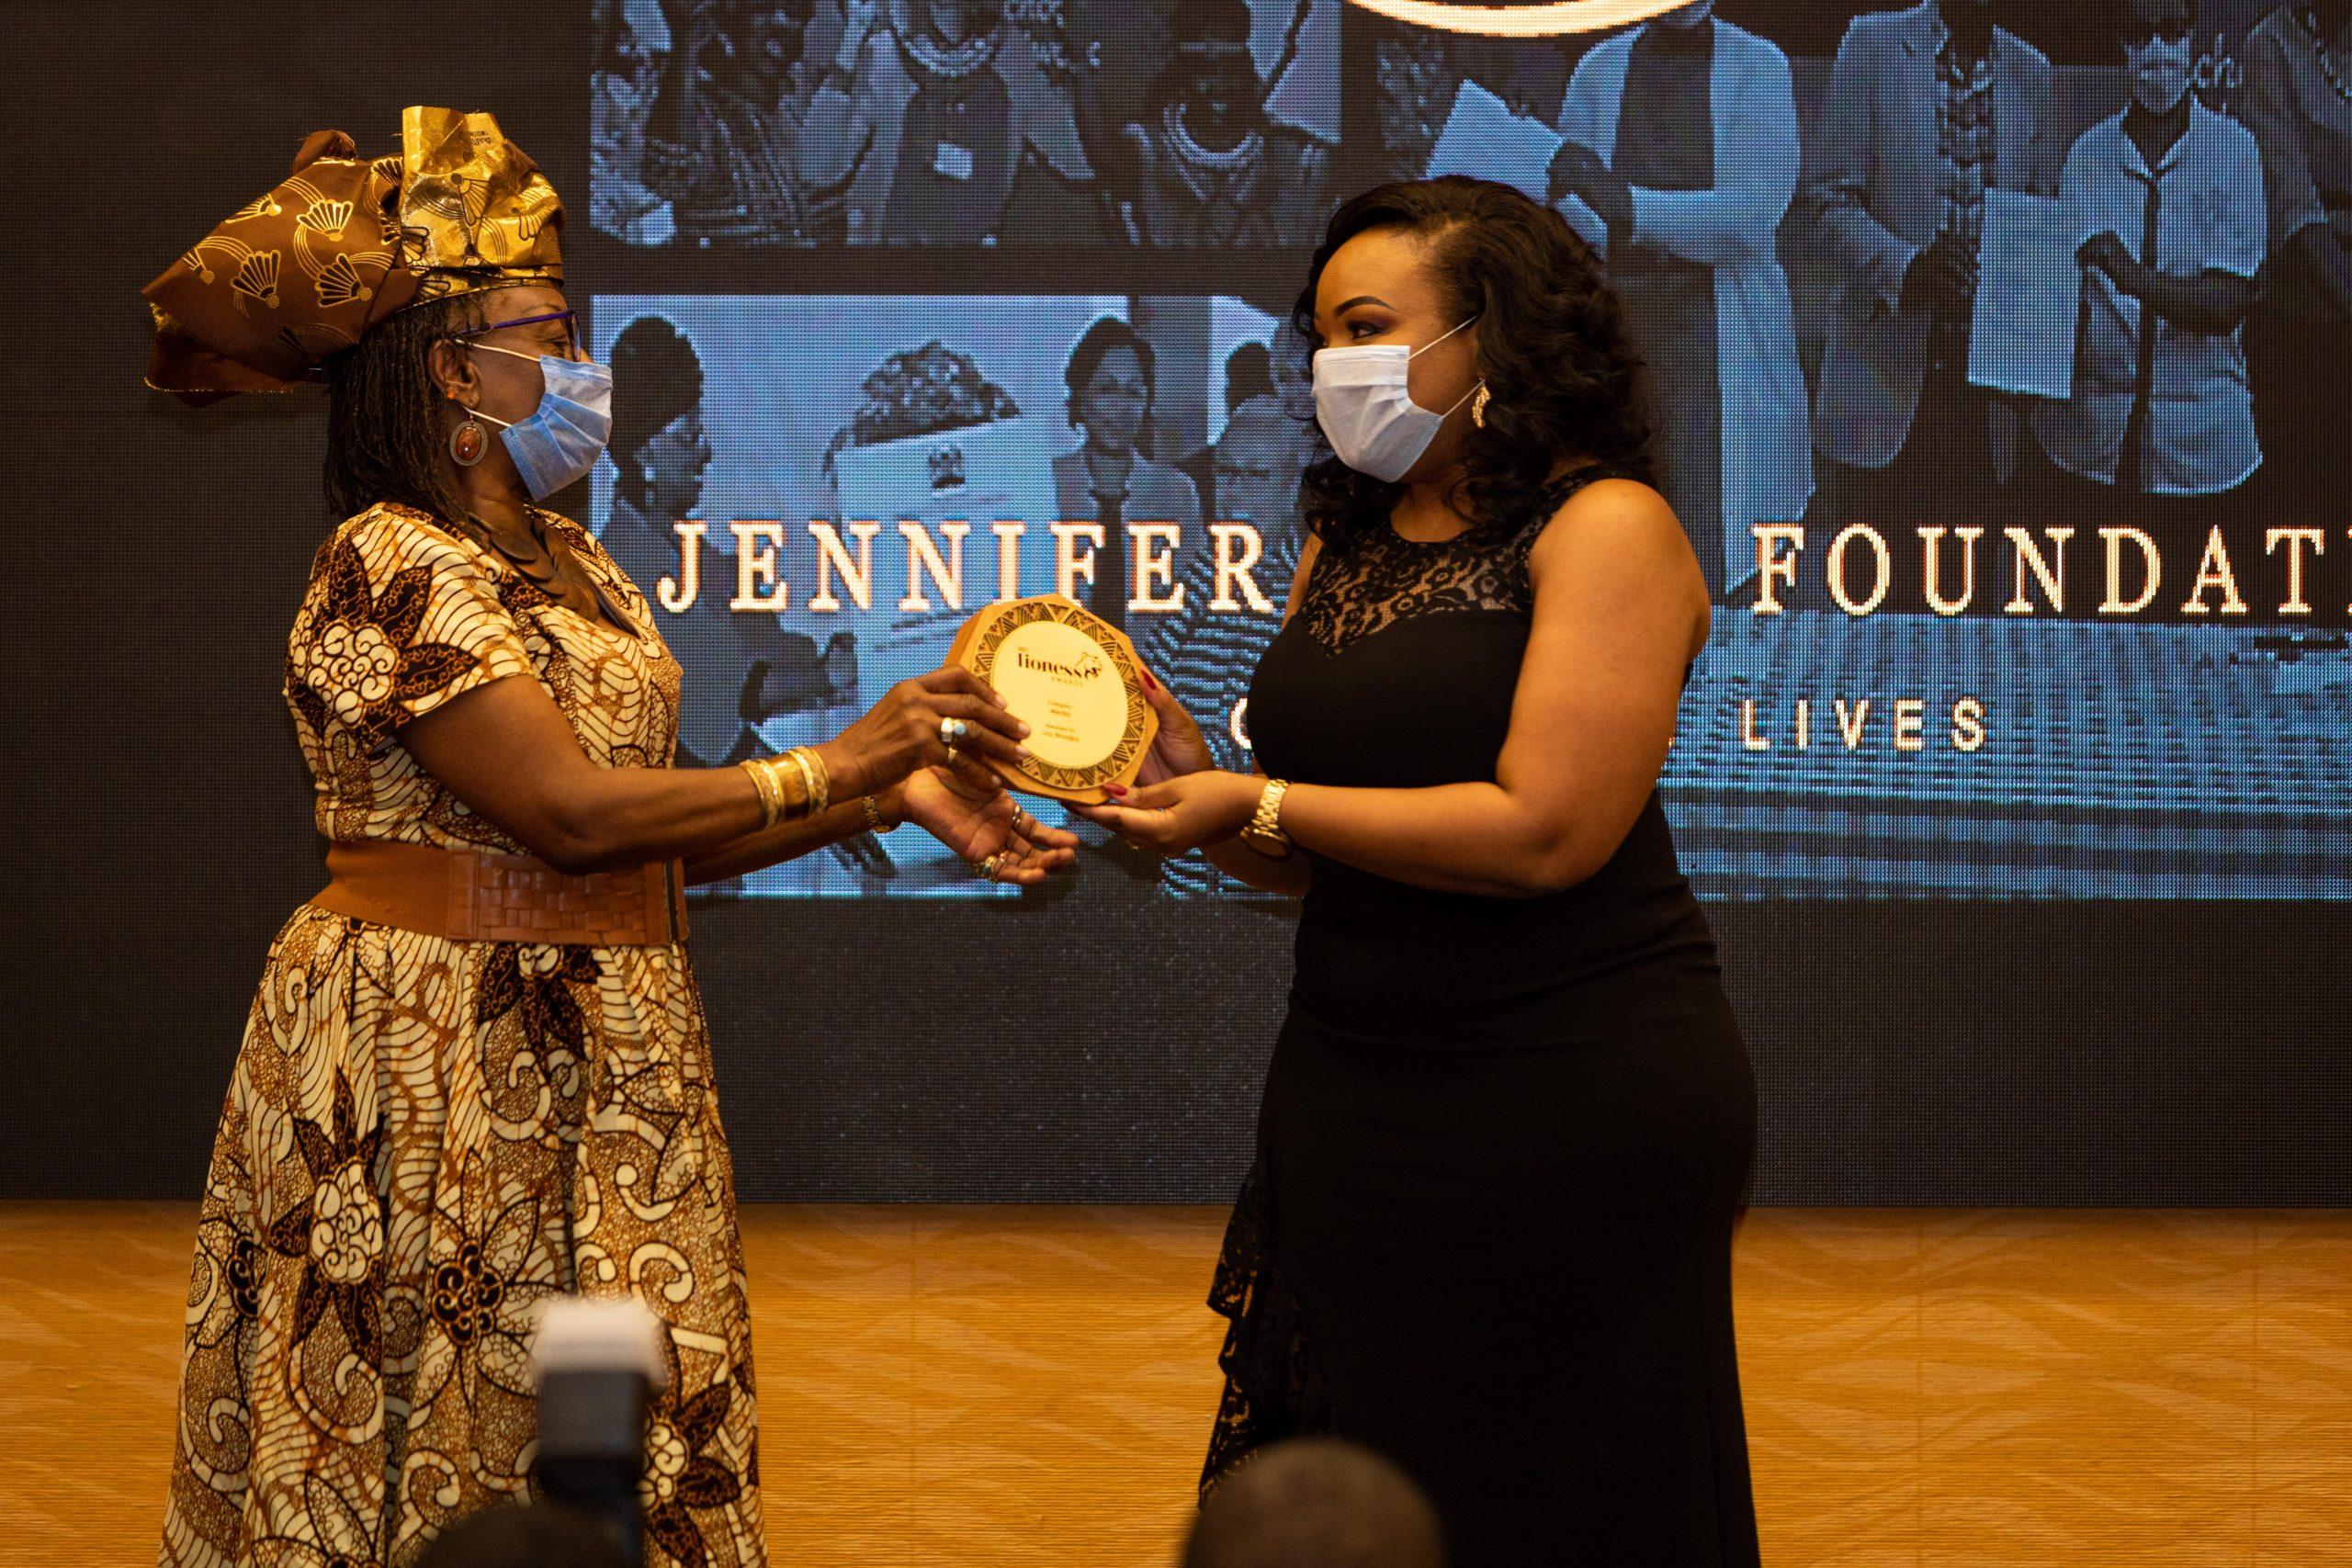 Lizz Ntonjira among five women awarded in inaugural Lioness Awards